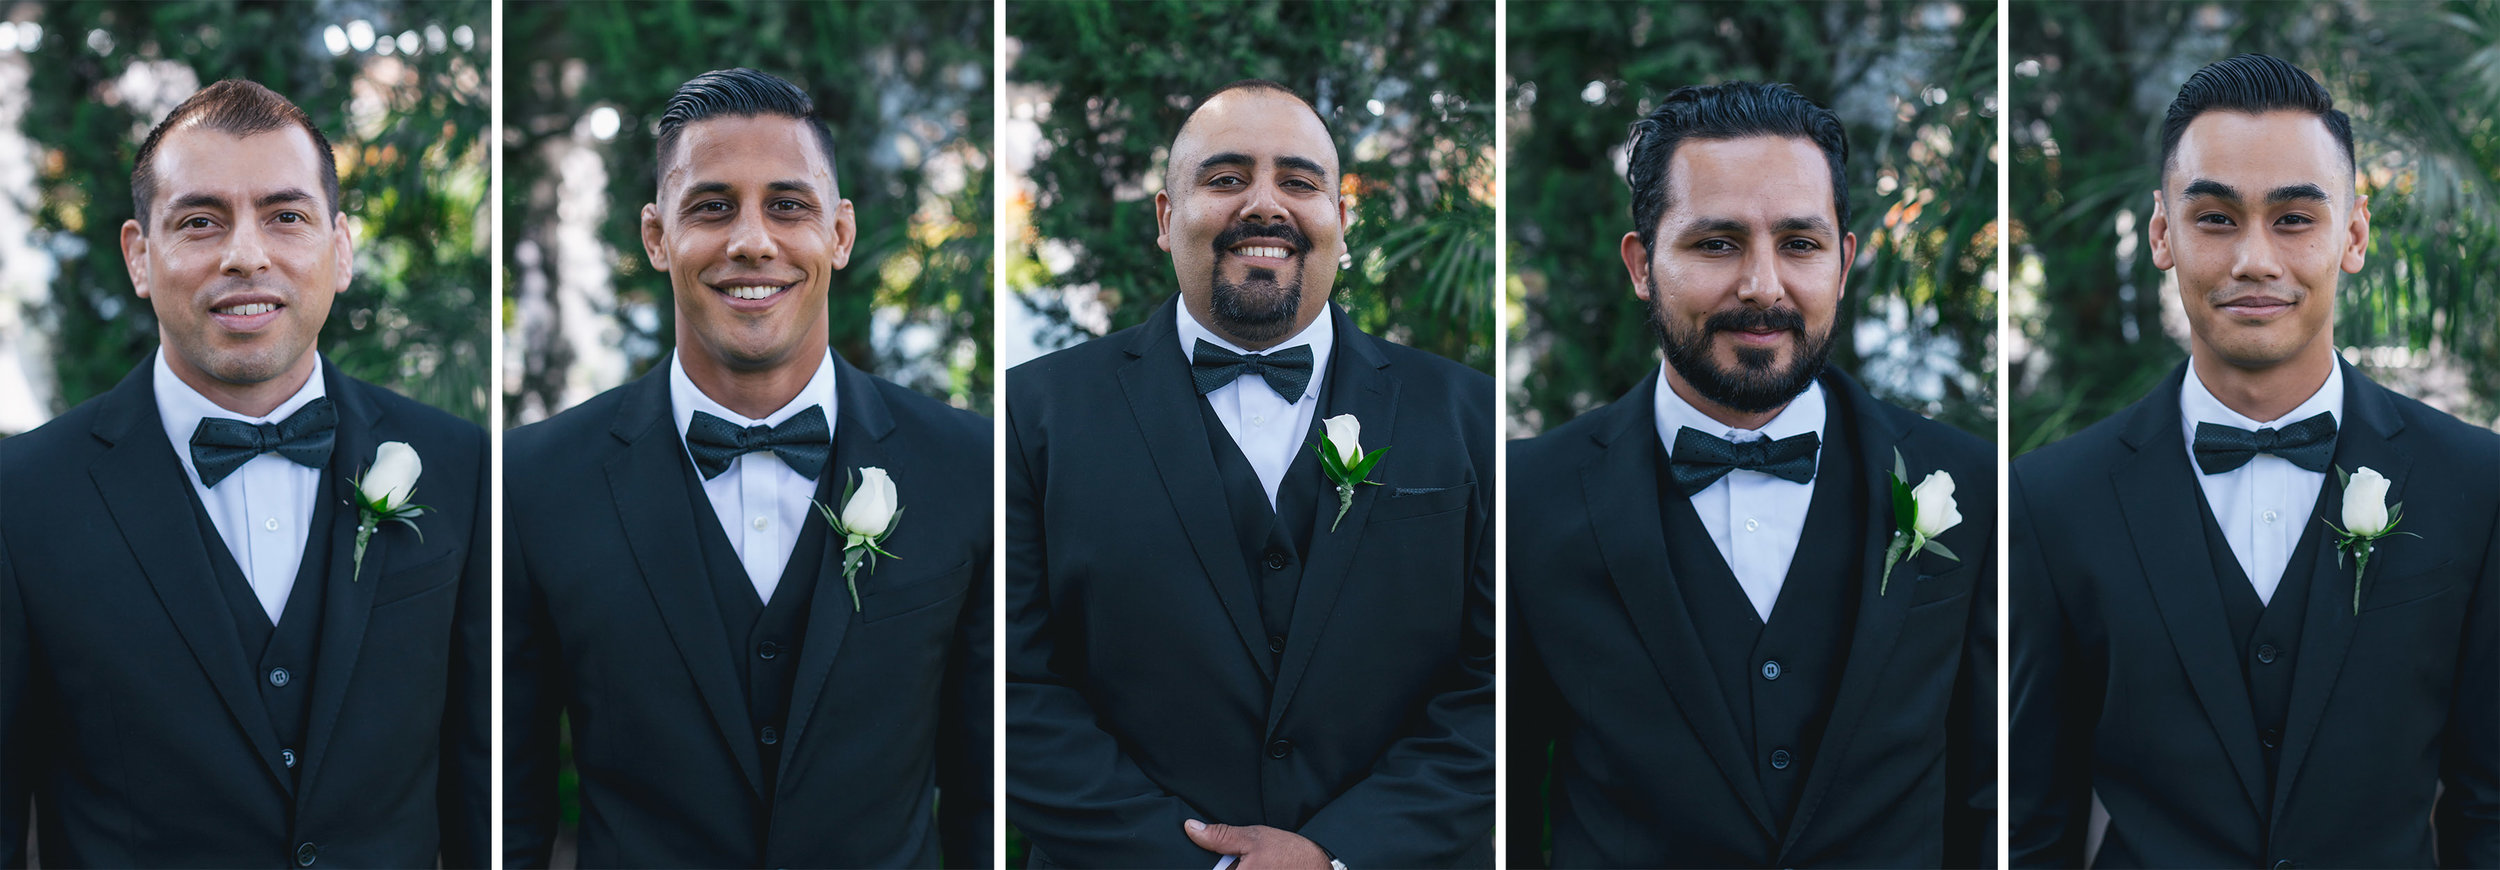 APavone-Photographer-Orange-County-Diamond-Bar-Wedding-01.jpg